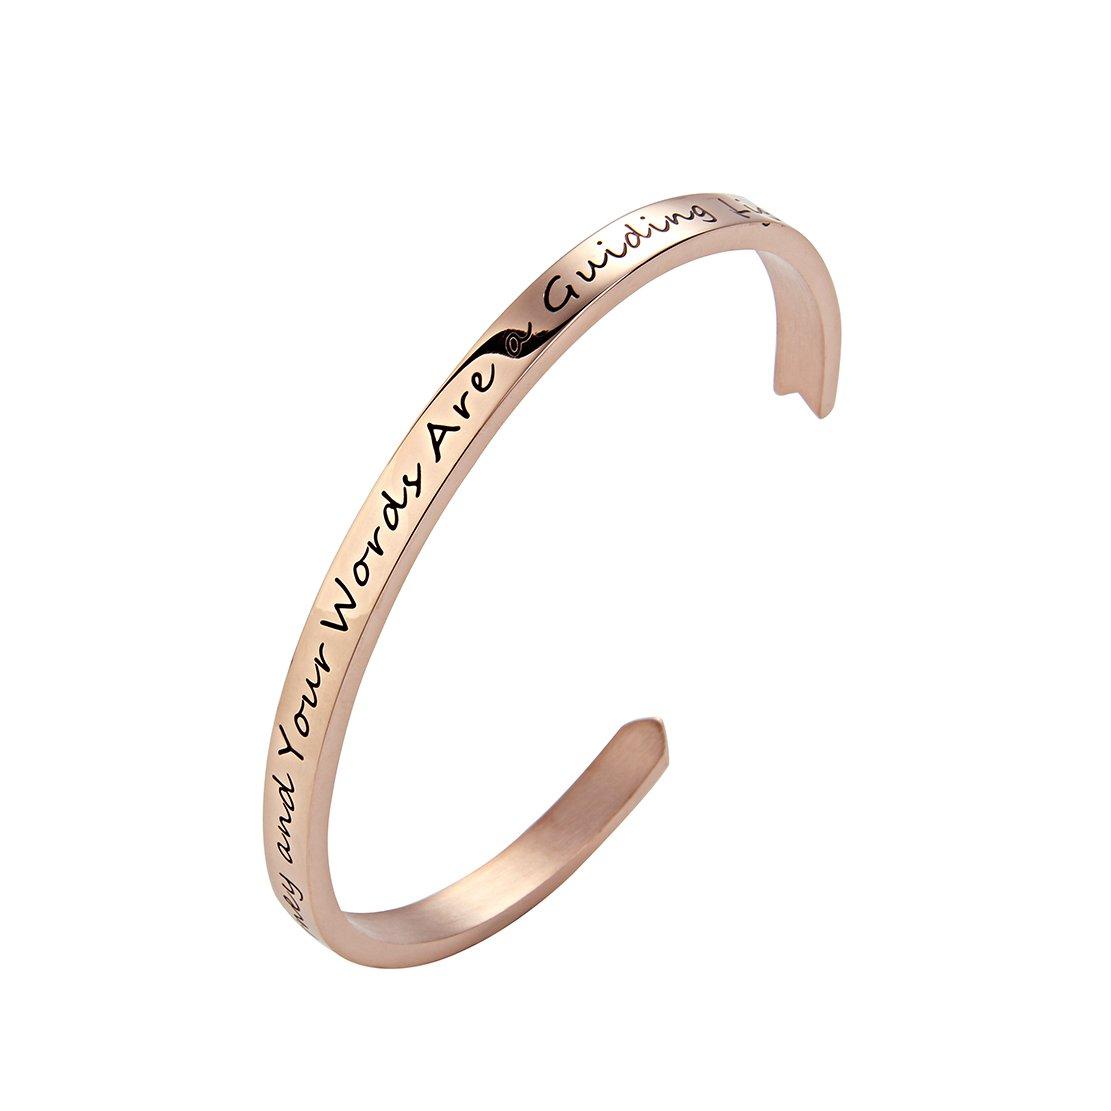 Meibai Teachers Bracelet Stainless Steel Arrow Cuff Bangle Engraved Words for Teacher Education Gift Chenzhou Meibai Jewelry Co. Ltd 0602TEACHER-CUFF